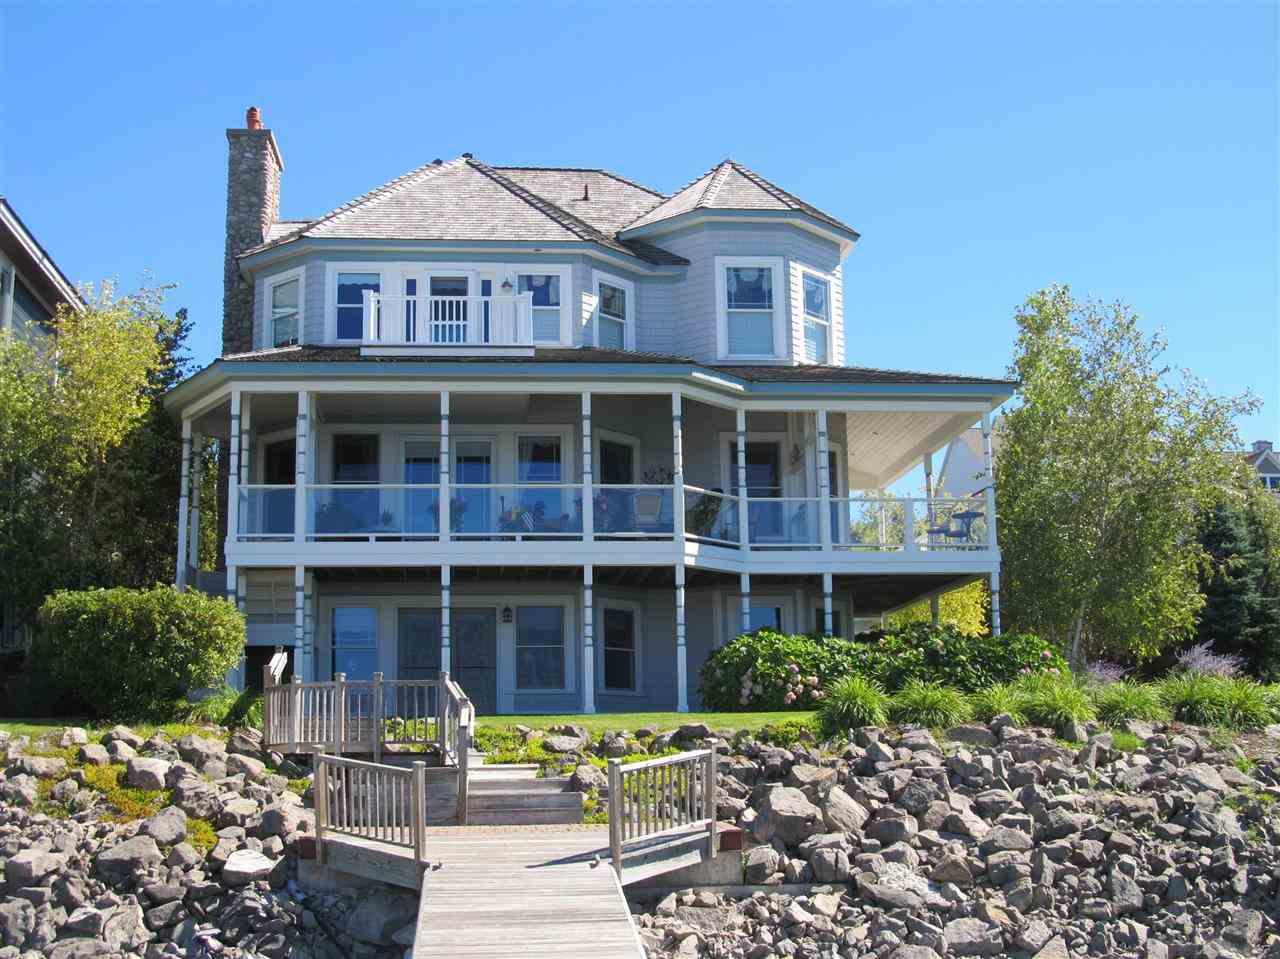 900 & 910 Vista Drive, Bay Harbor, MI 49770